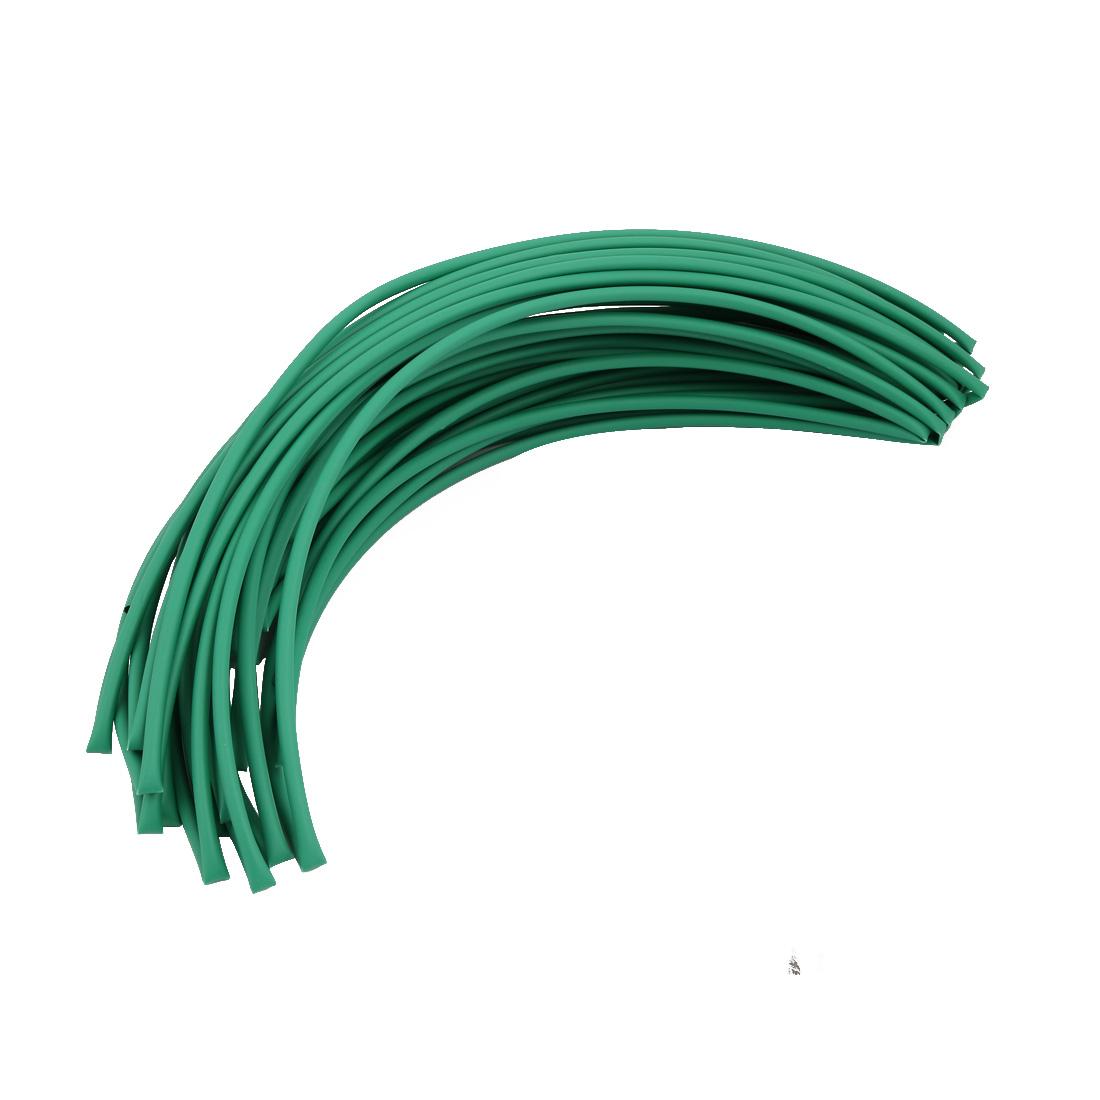 20M 0.18in Inner Dia Polyolefin Flame Retardant Tube Green for Wire Repairing